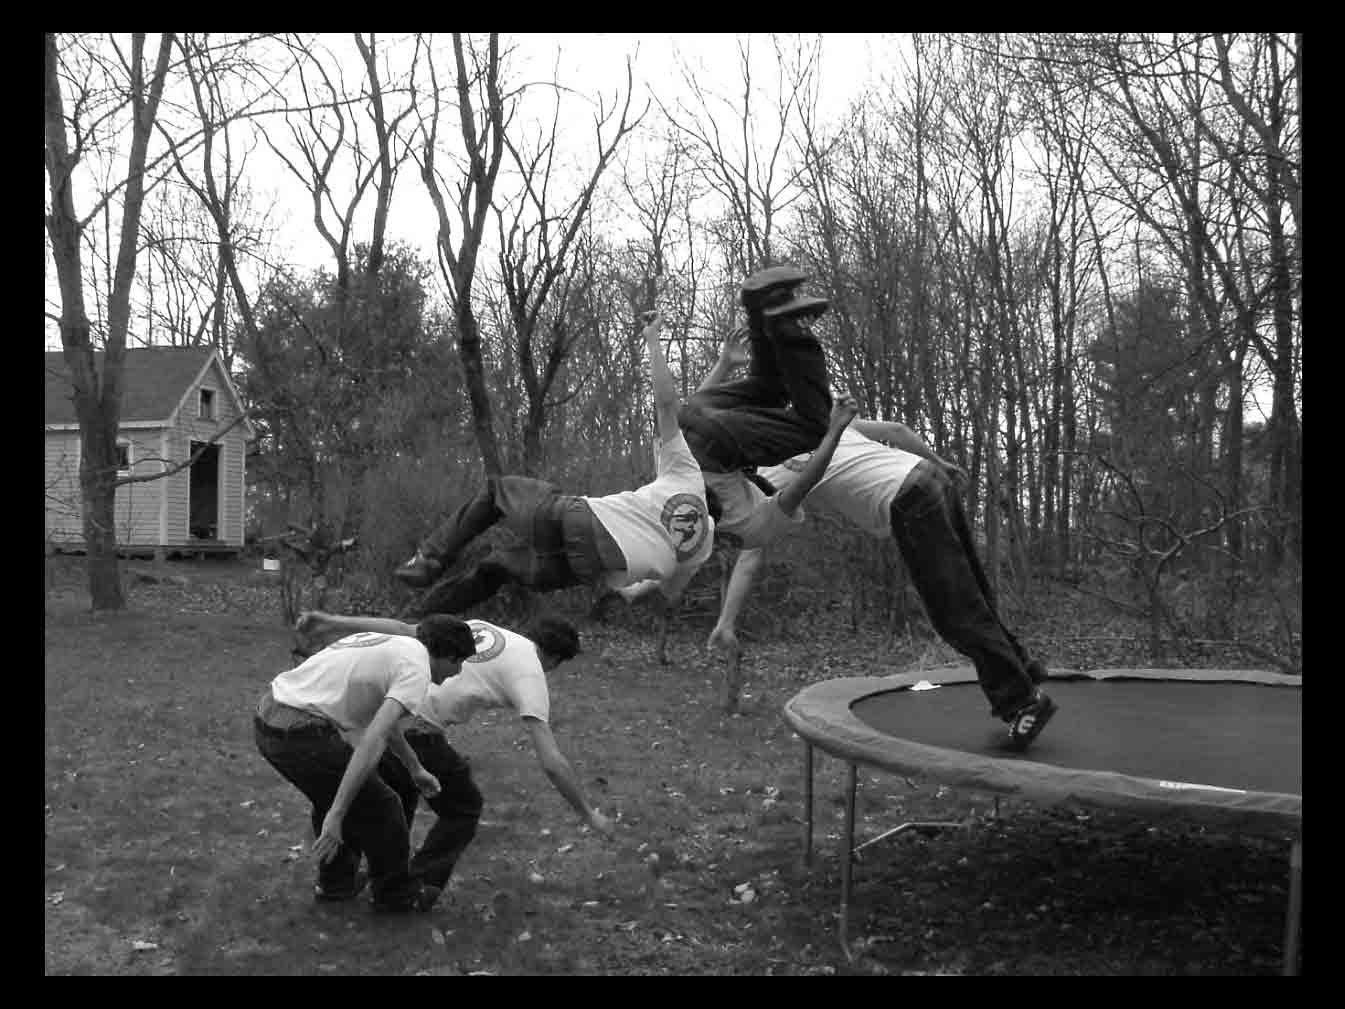 Misty 5 seq of trampoline